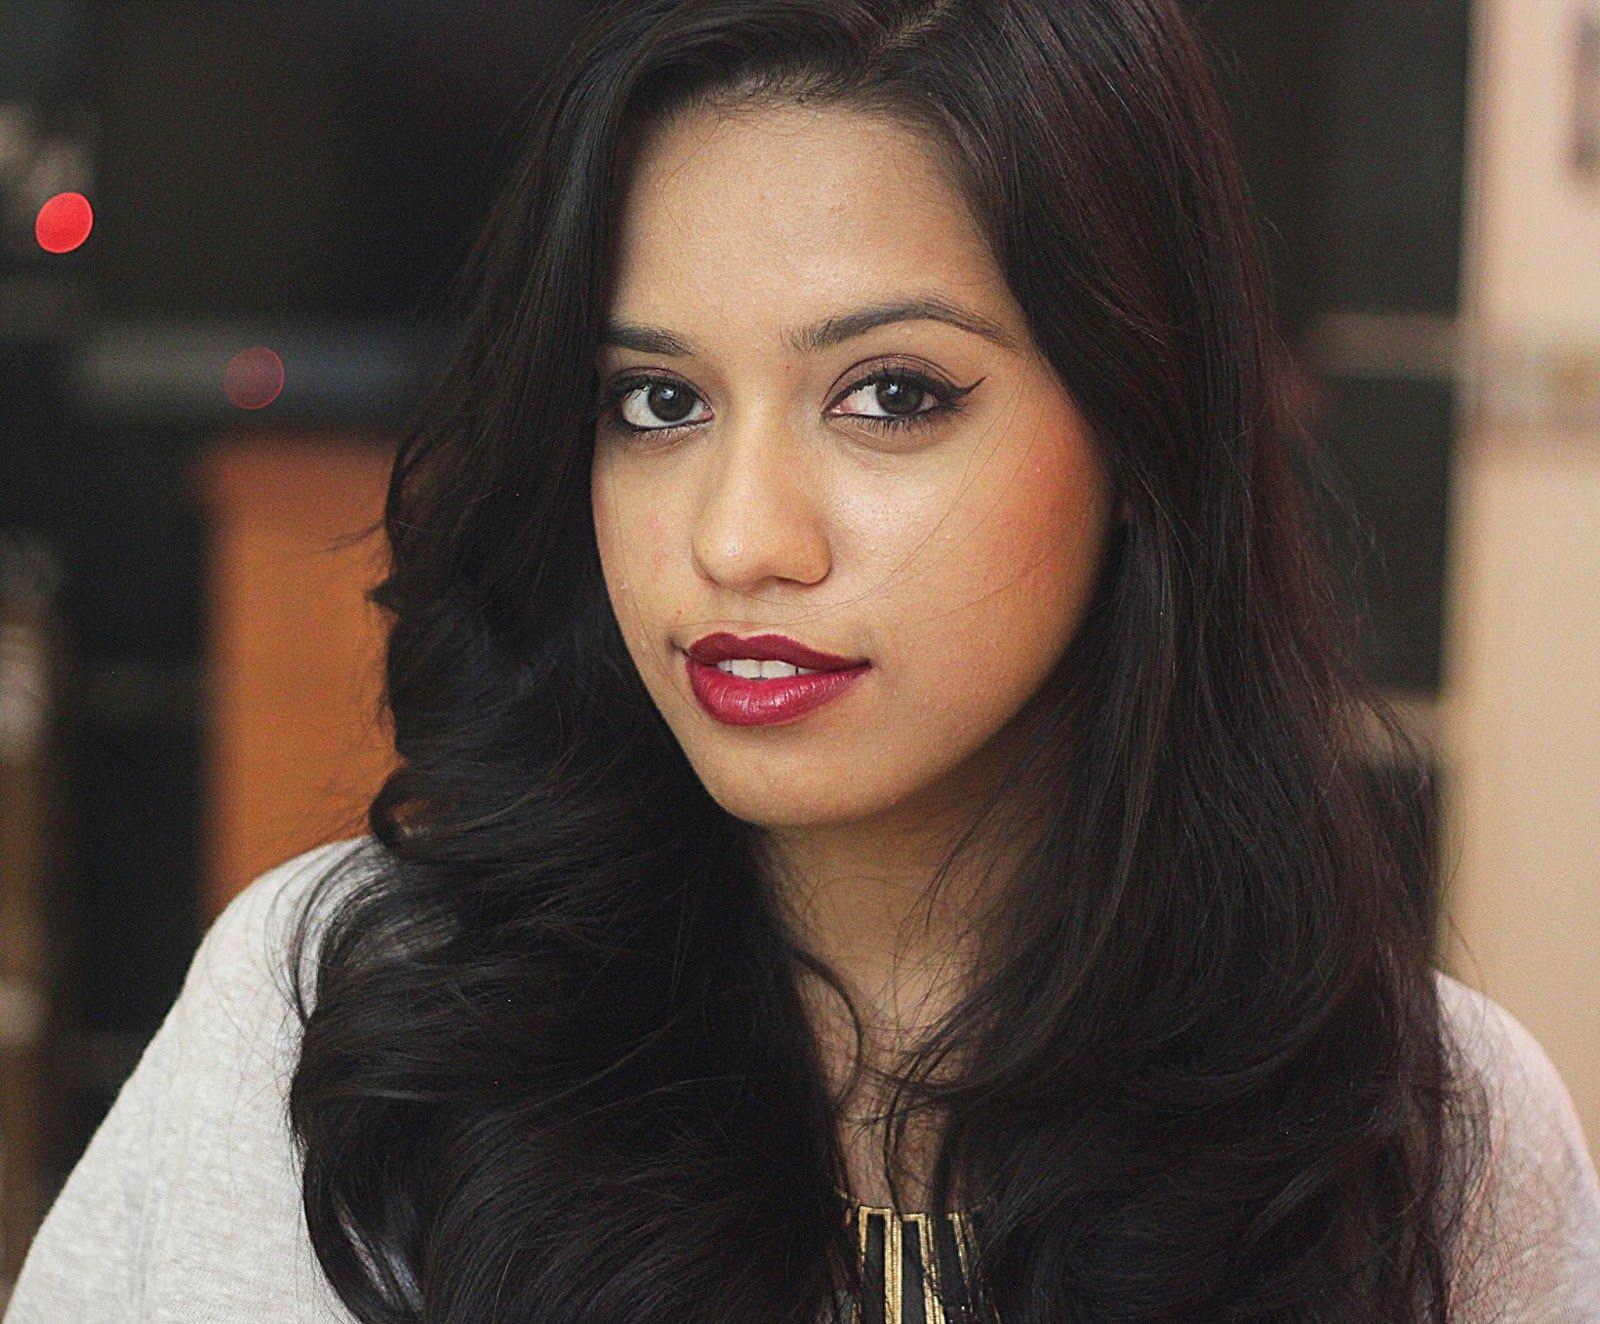 Top 5 Dark Lipsticks for Indian Skin Tone | All She Needs | Indian Beauty, Fashi... -  Top 5 Dark L